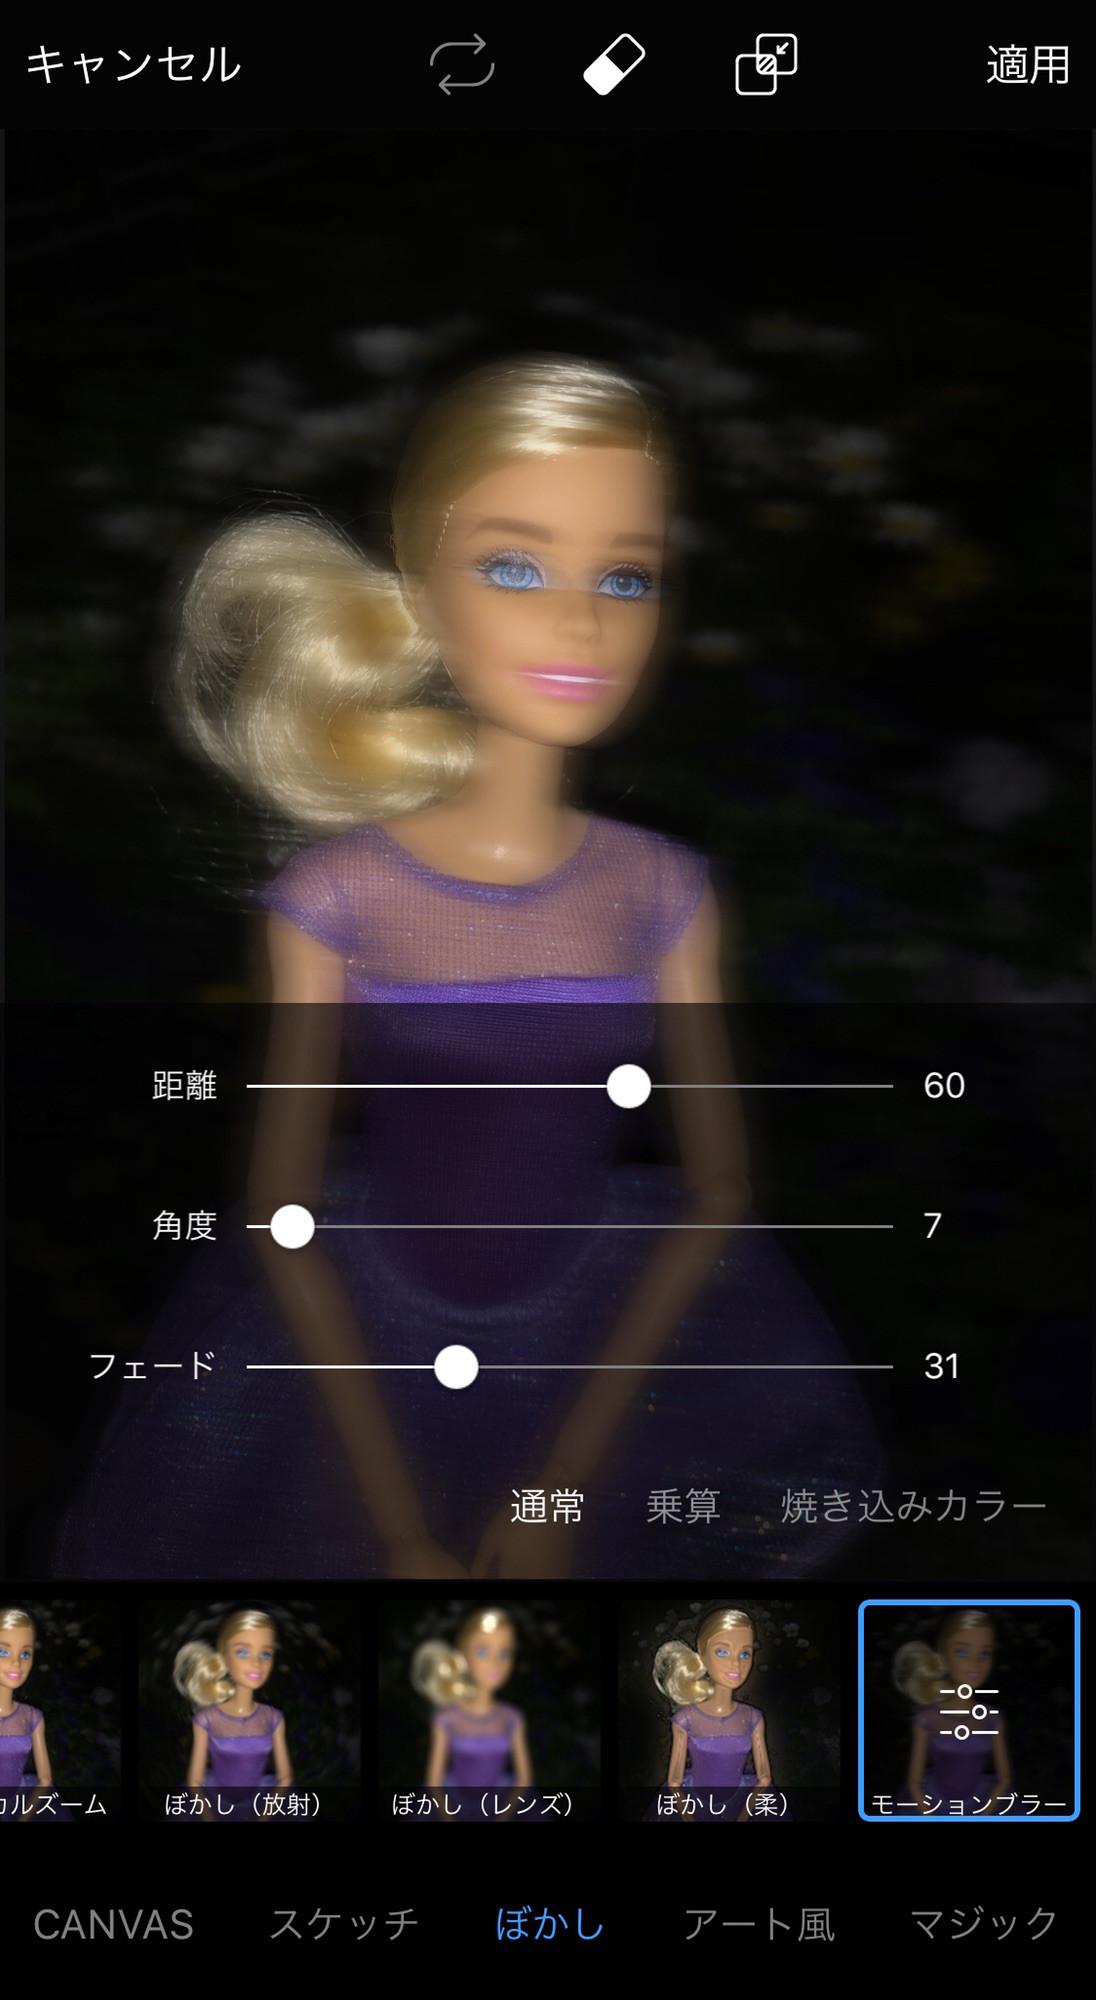 【PicsArt】エモい写真の加工方法❕